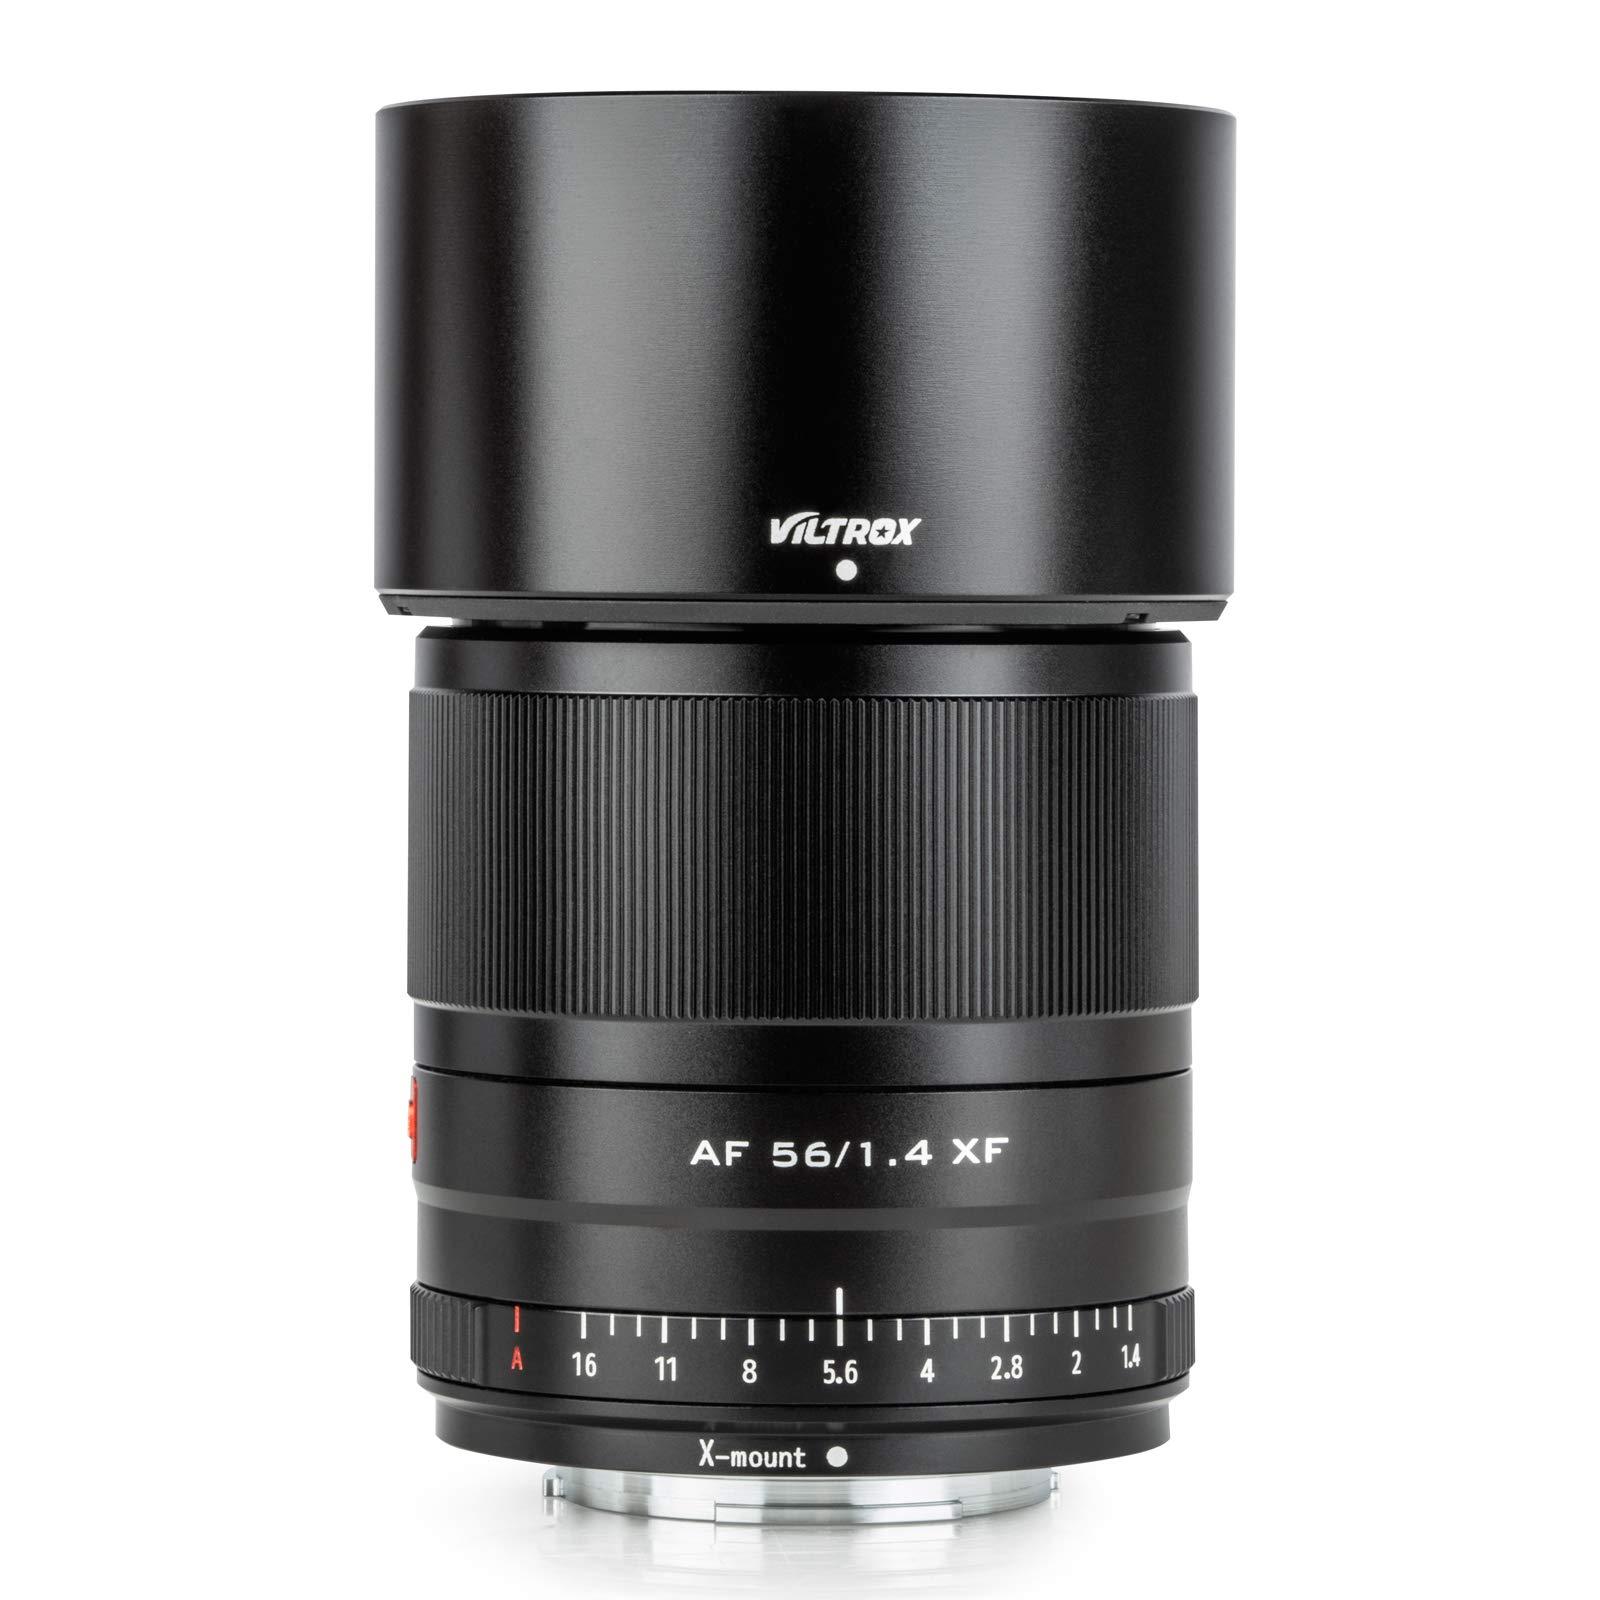 VILTROX 56mm F1.4 AF MF STM Fixed Focus Prime Lens Auto Focus for Fuji X Mount Fujifilm X-T3 X-T2 X-T1 X-T30 X-T20 X-T100 Cameras